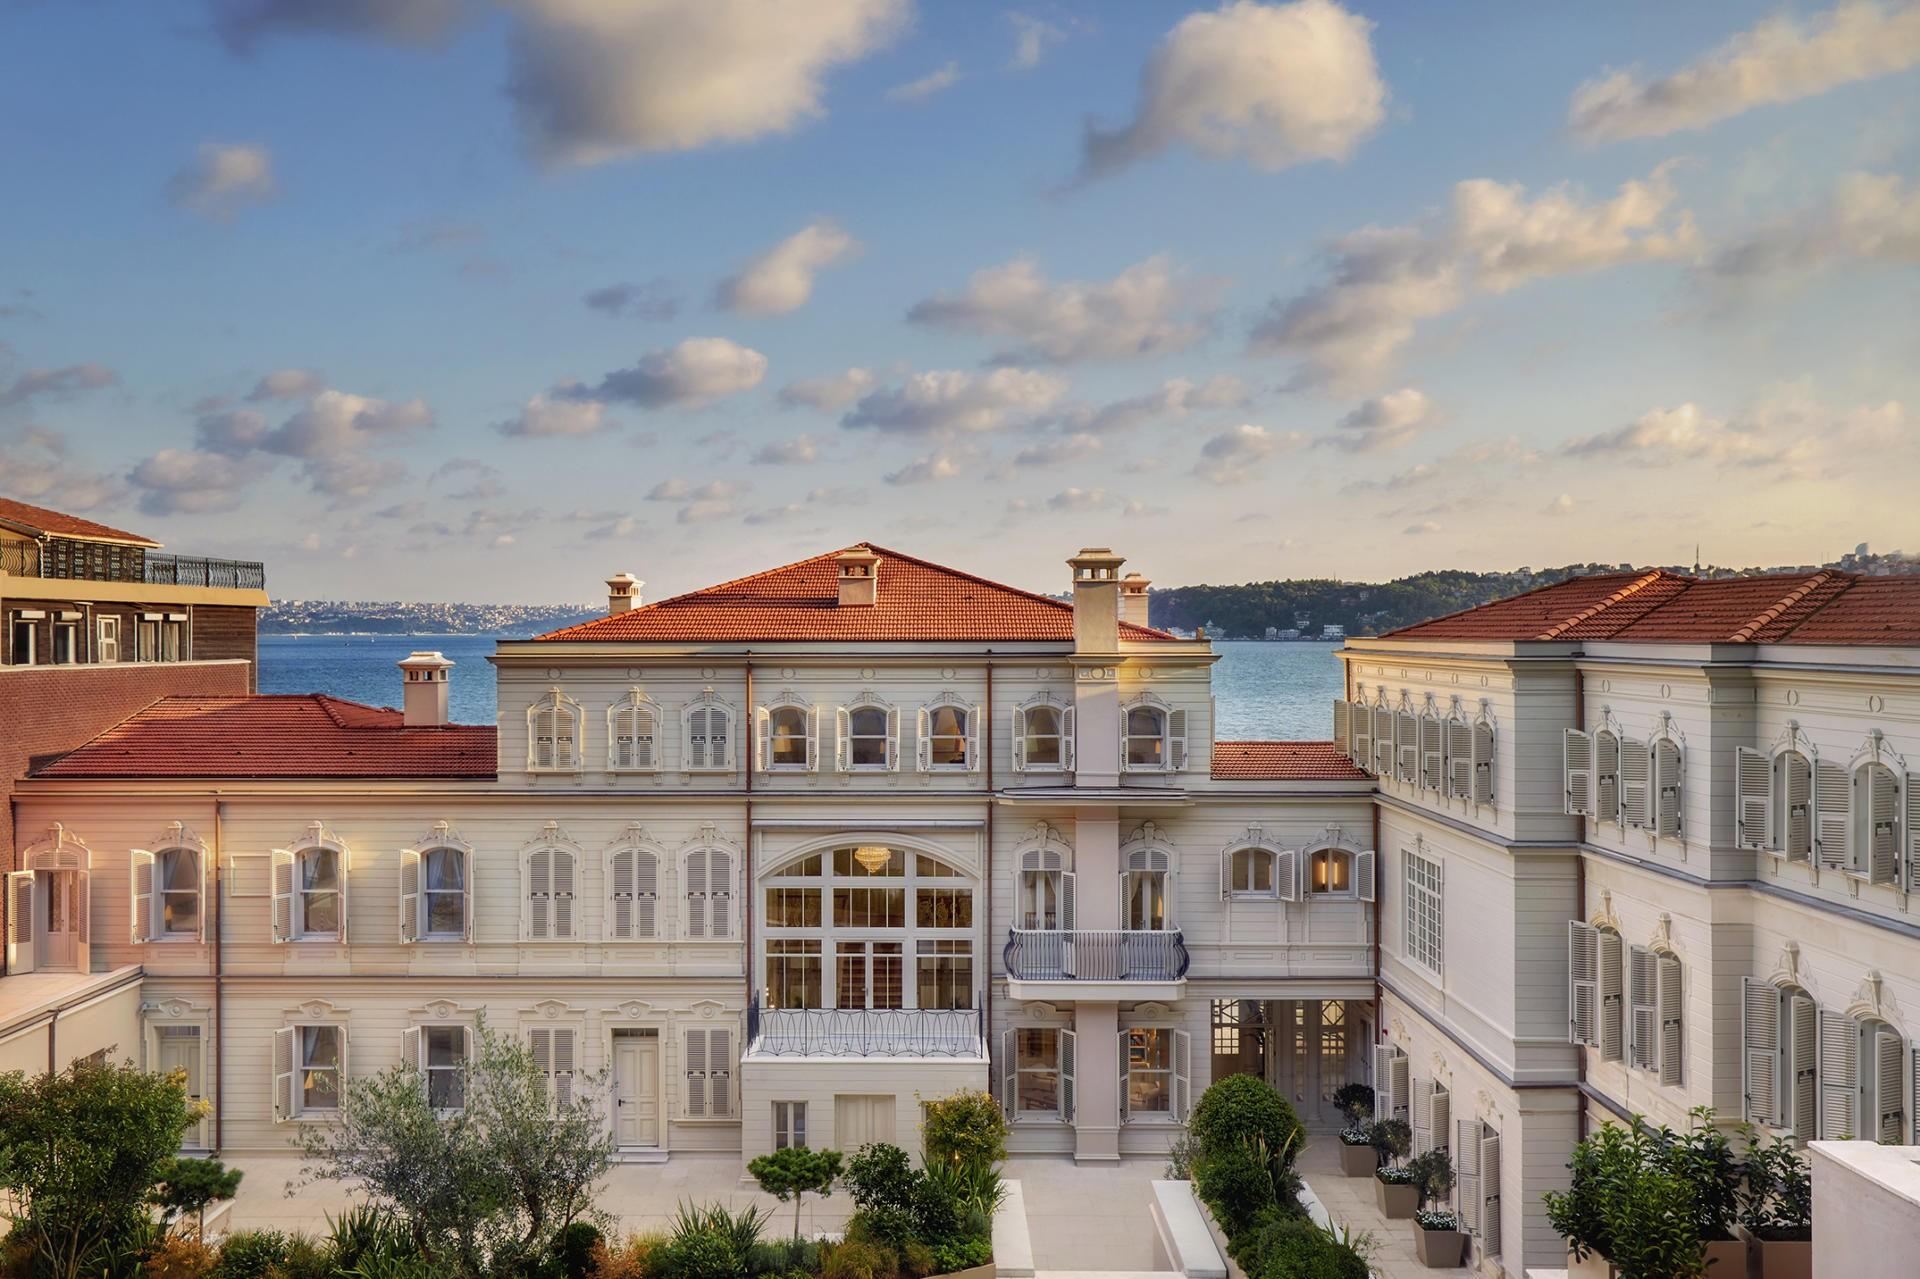 Iridium Spa | The St. Regis Istanbul